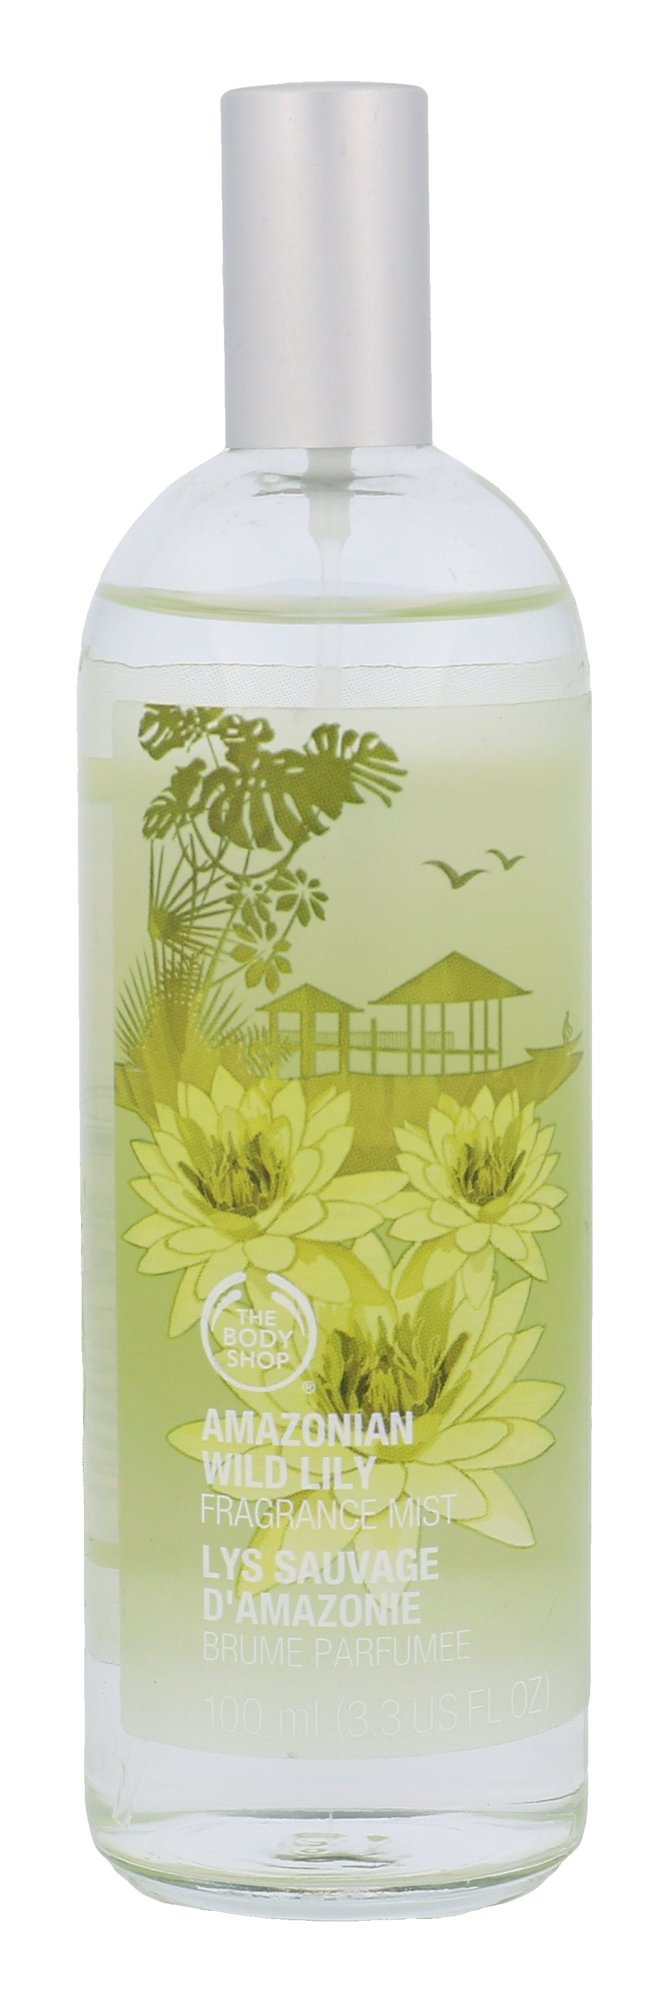 The Body Shop Amazonian Wild Lily